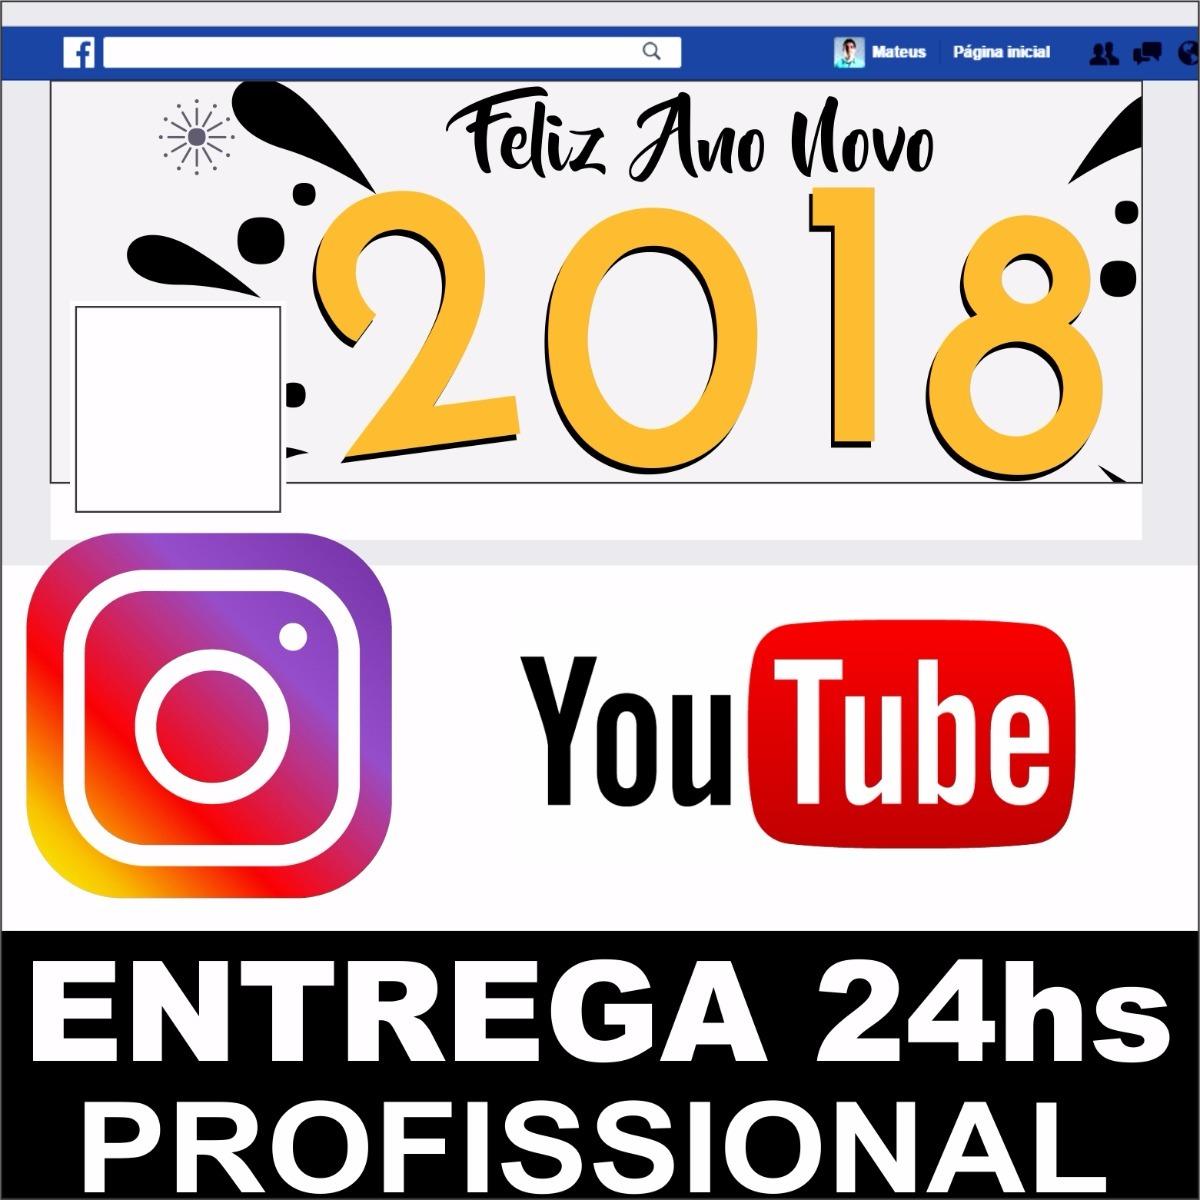 904145a4c7 Arte Capa Facebook Instagram Youtube Fanpage Barato Promoção - R  24 ...